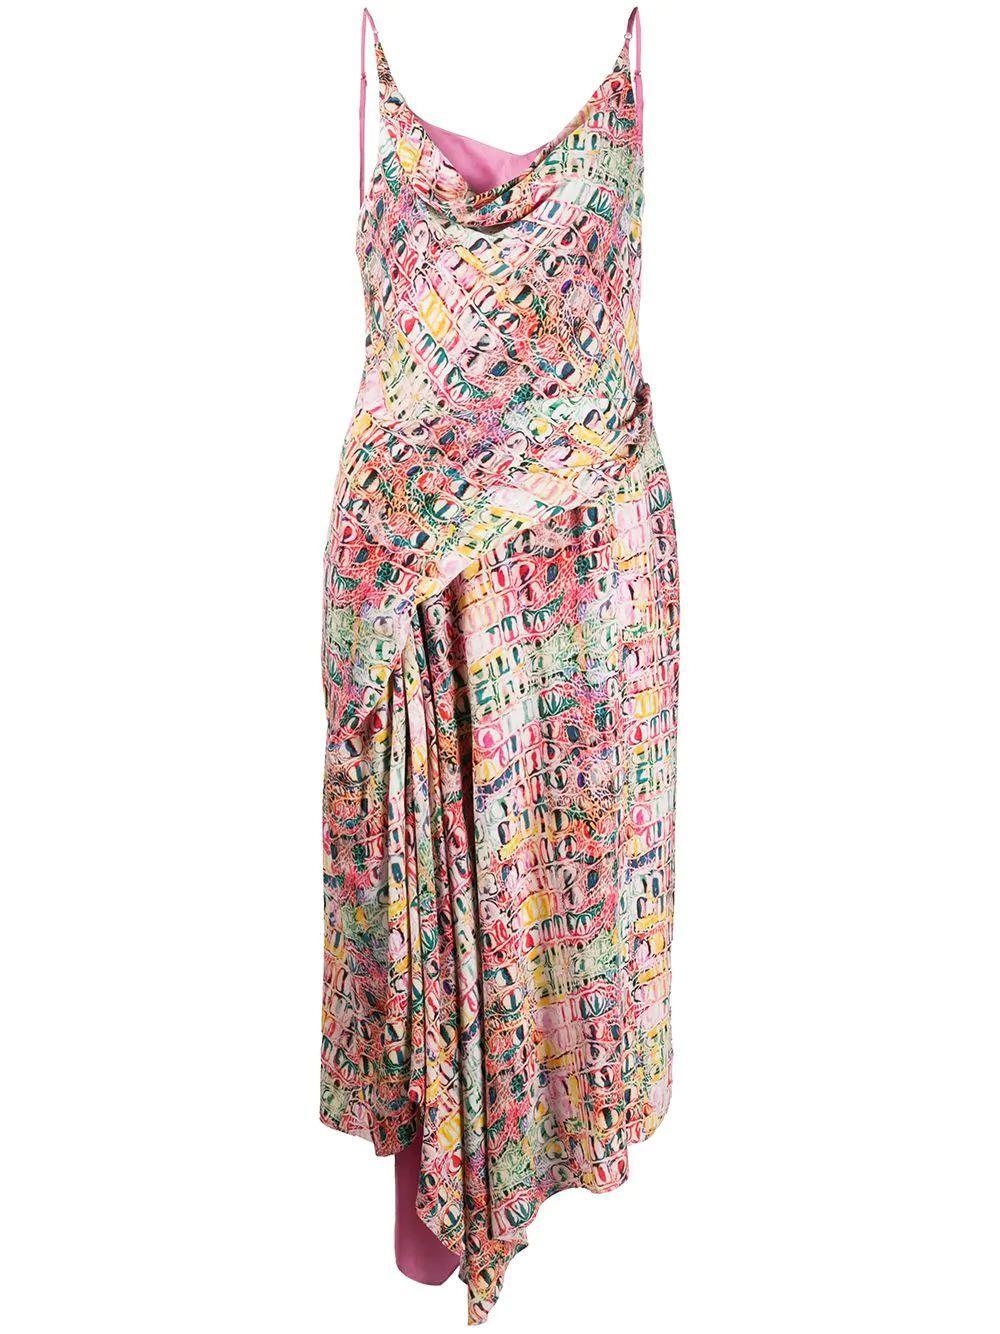 Farrah Croco Print Dress